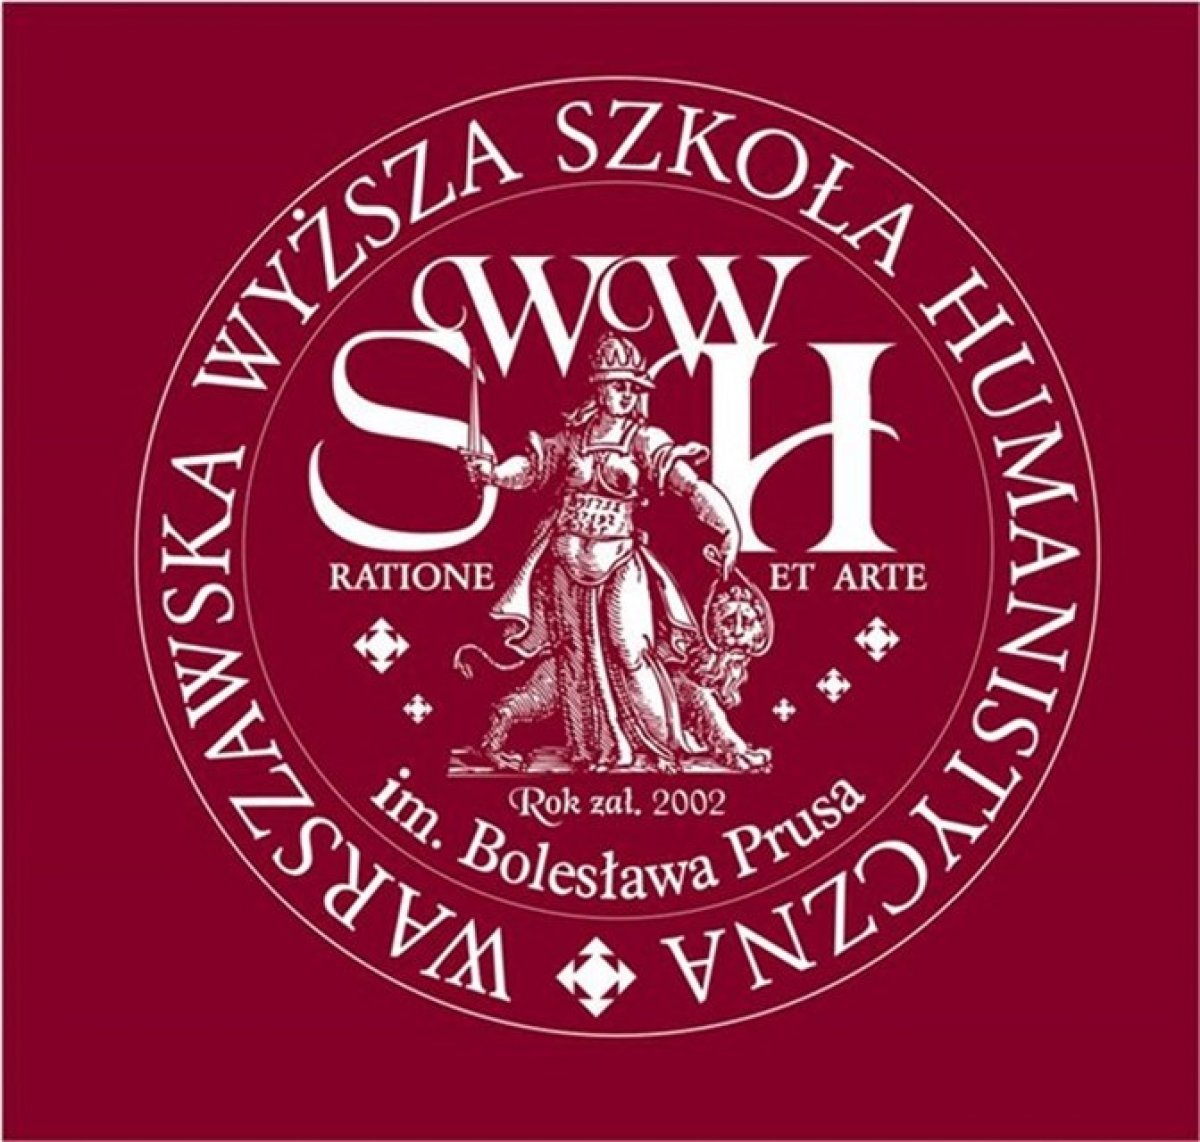 STUDIA: PSYCHOLOGIA, PEDAGOGIKA, DZIENNIKARSTWO Warszawa - 1